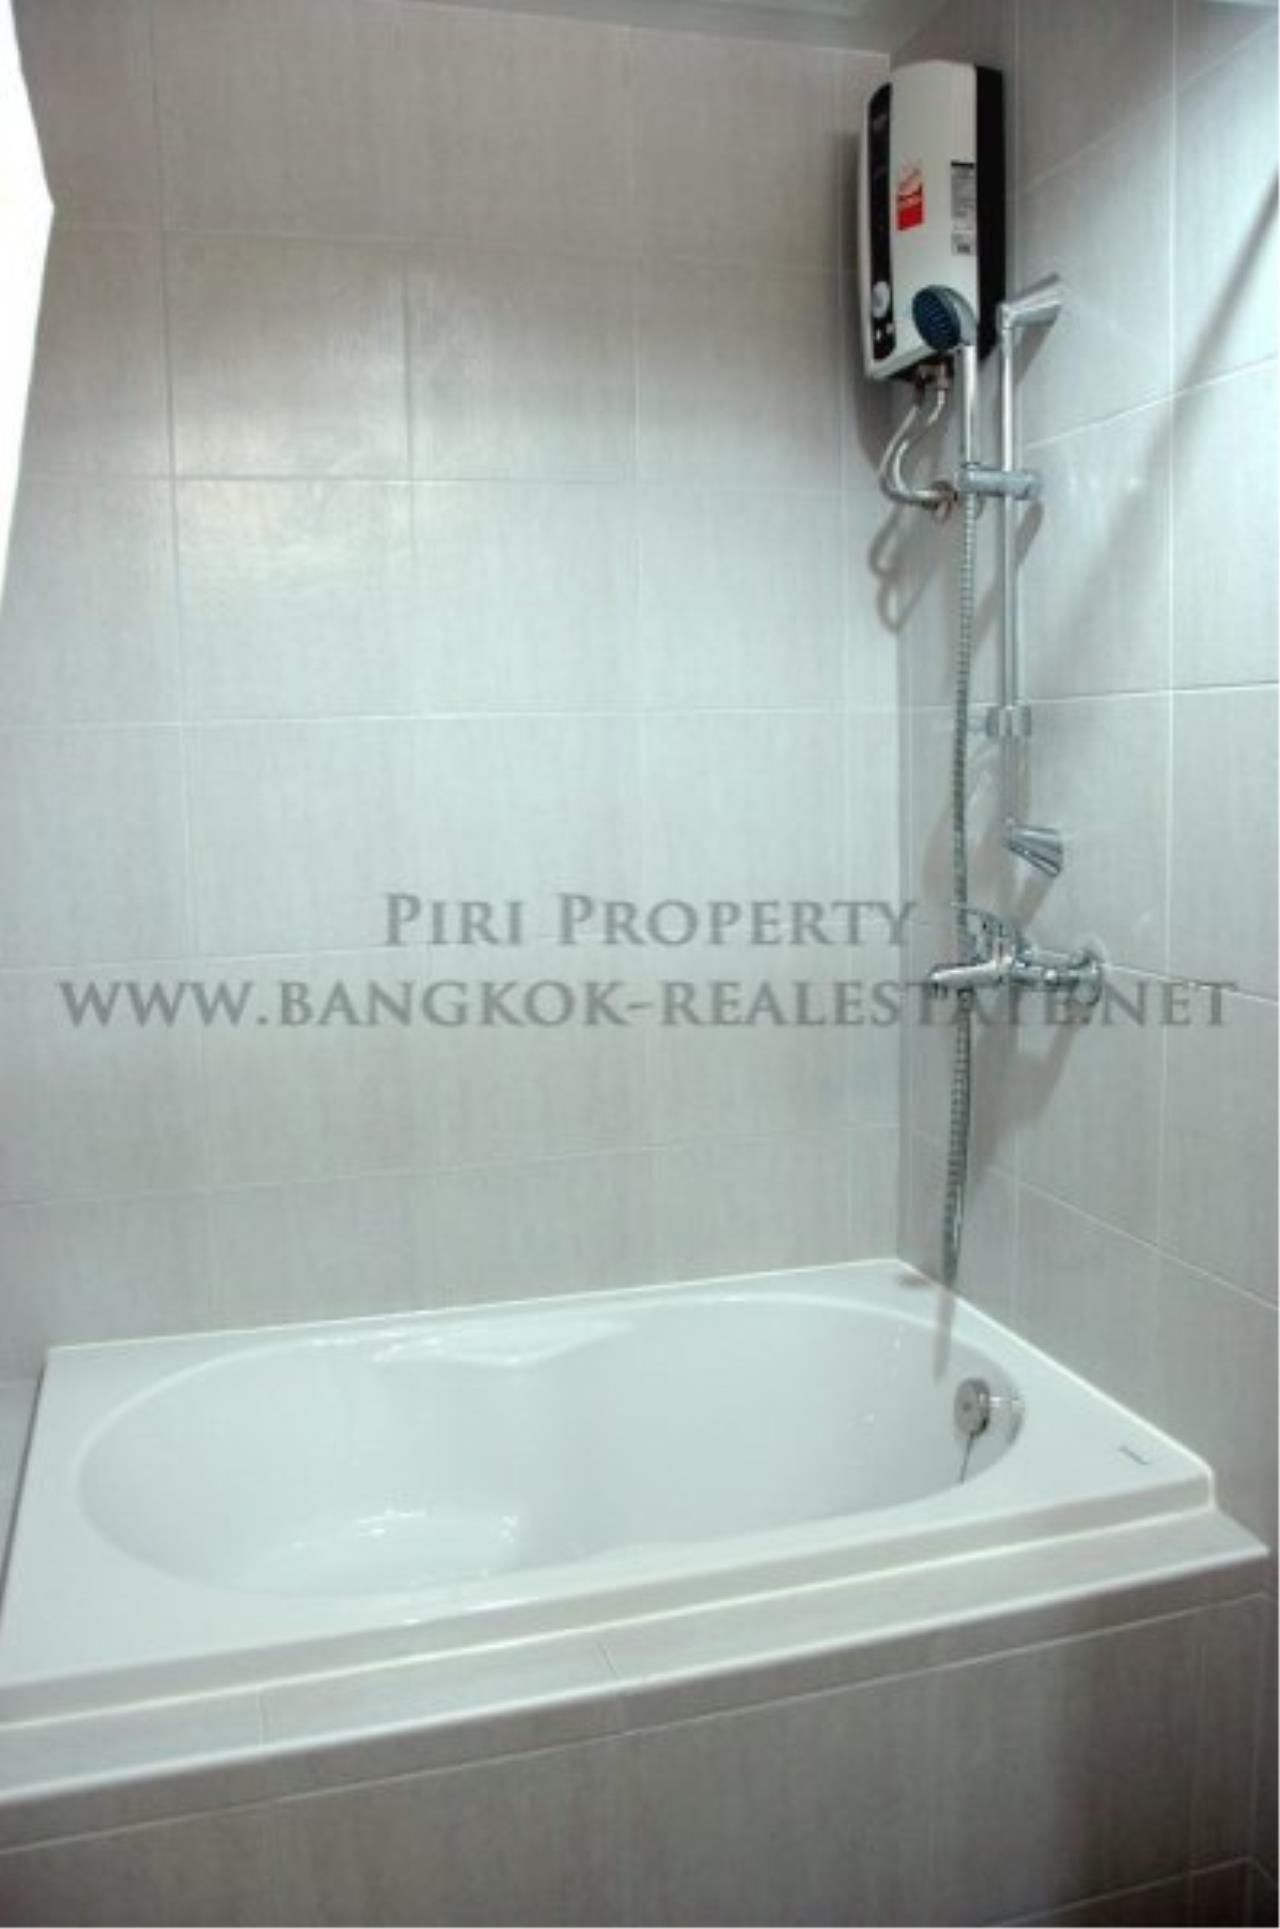 Piri Property Agency's Condo One X - One Bedroom on 17th Floor 10